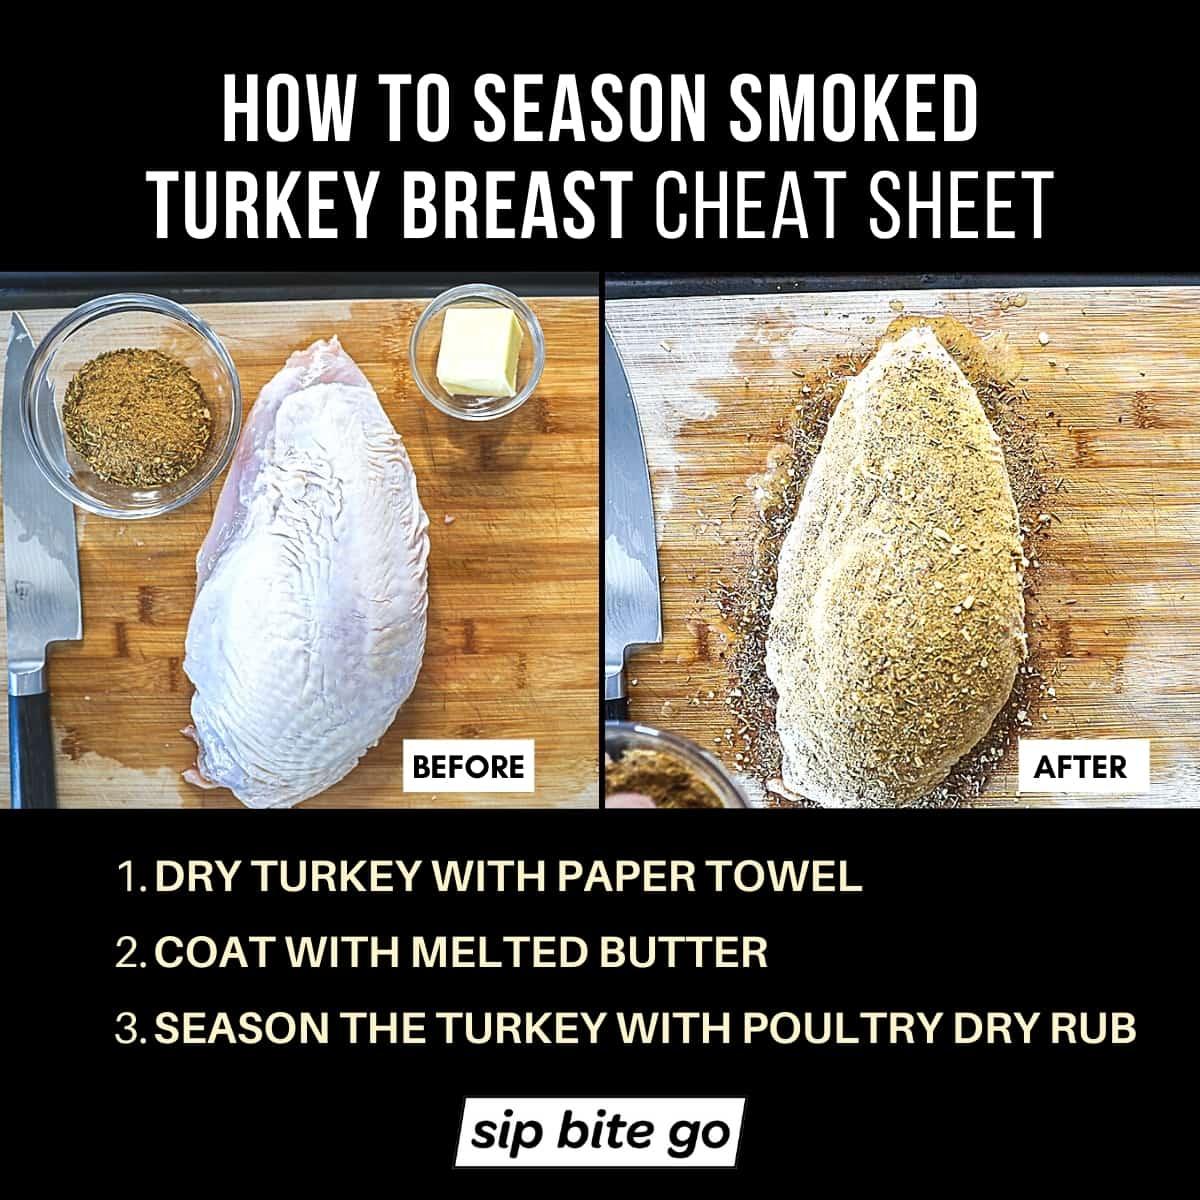 Infographic demonstrating How to SEASON SMOKED TURKEY BREAST